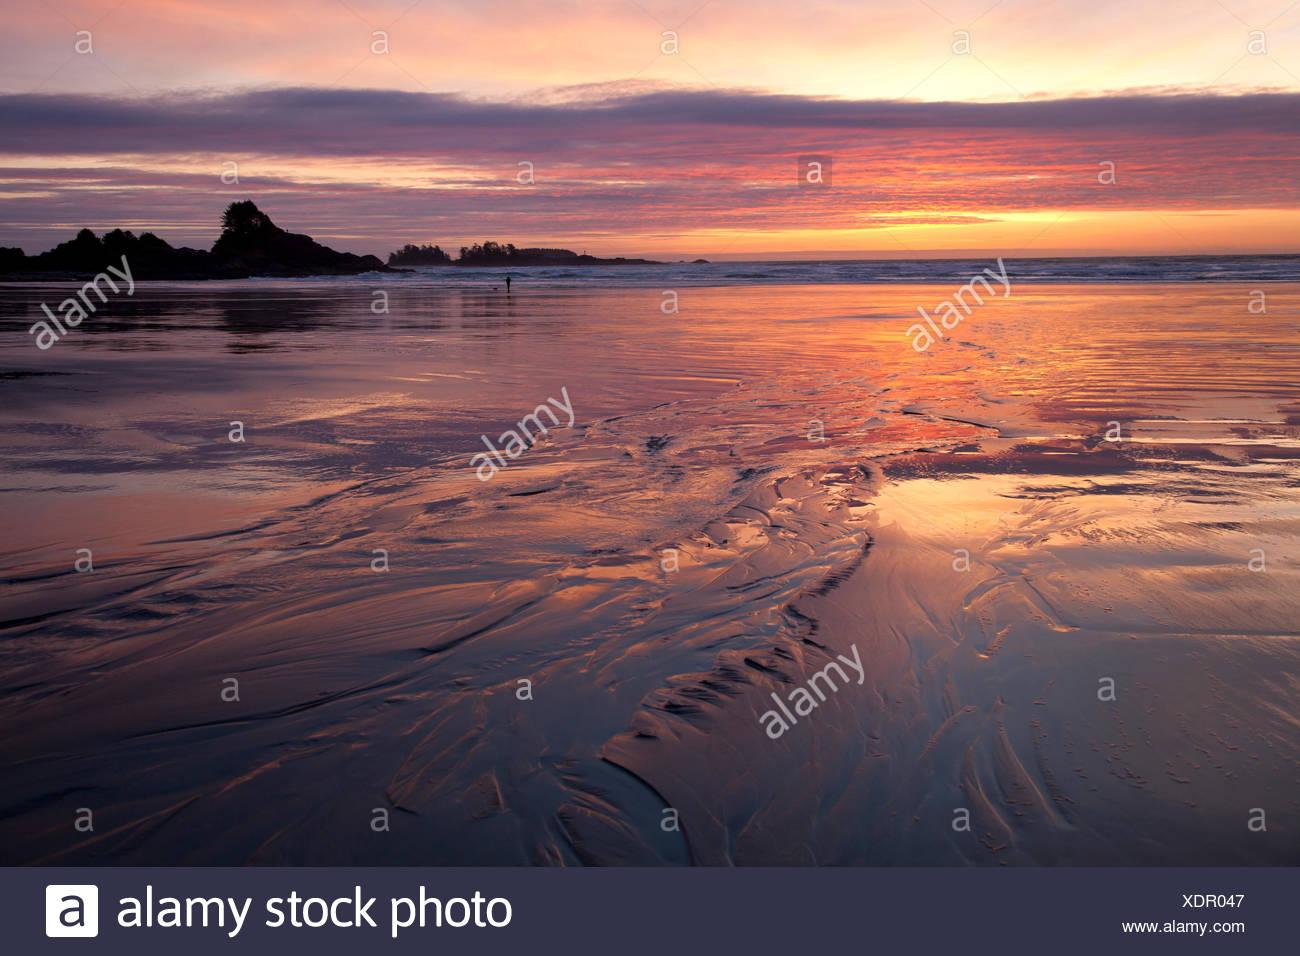 Cox bay near tofino stock photos cox bay near tofino stock cox bay and sunset point at sunset near tofino british columbia canada on vancouver nvjuhfo Image collections